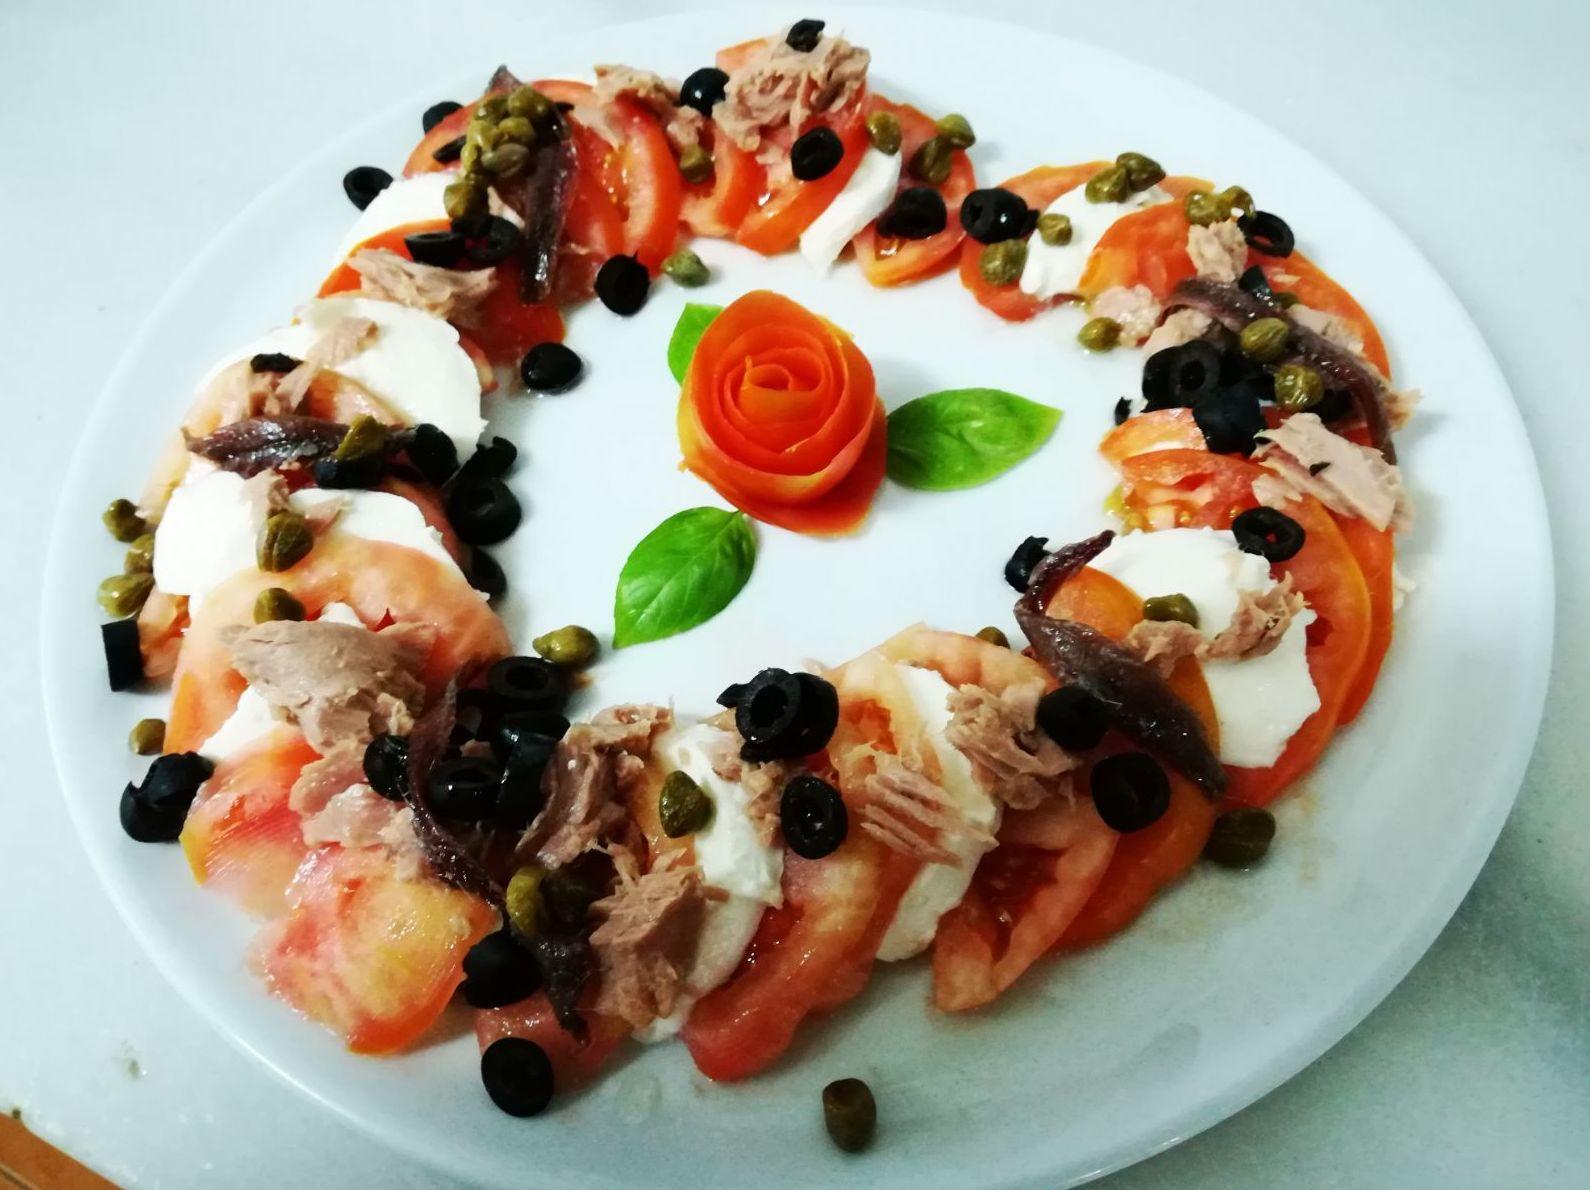 Ensalada italiana: tomate, mozzarella de bufala, alcaparras, olivas, atun y anchoas